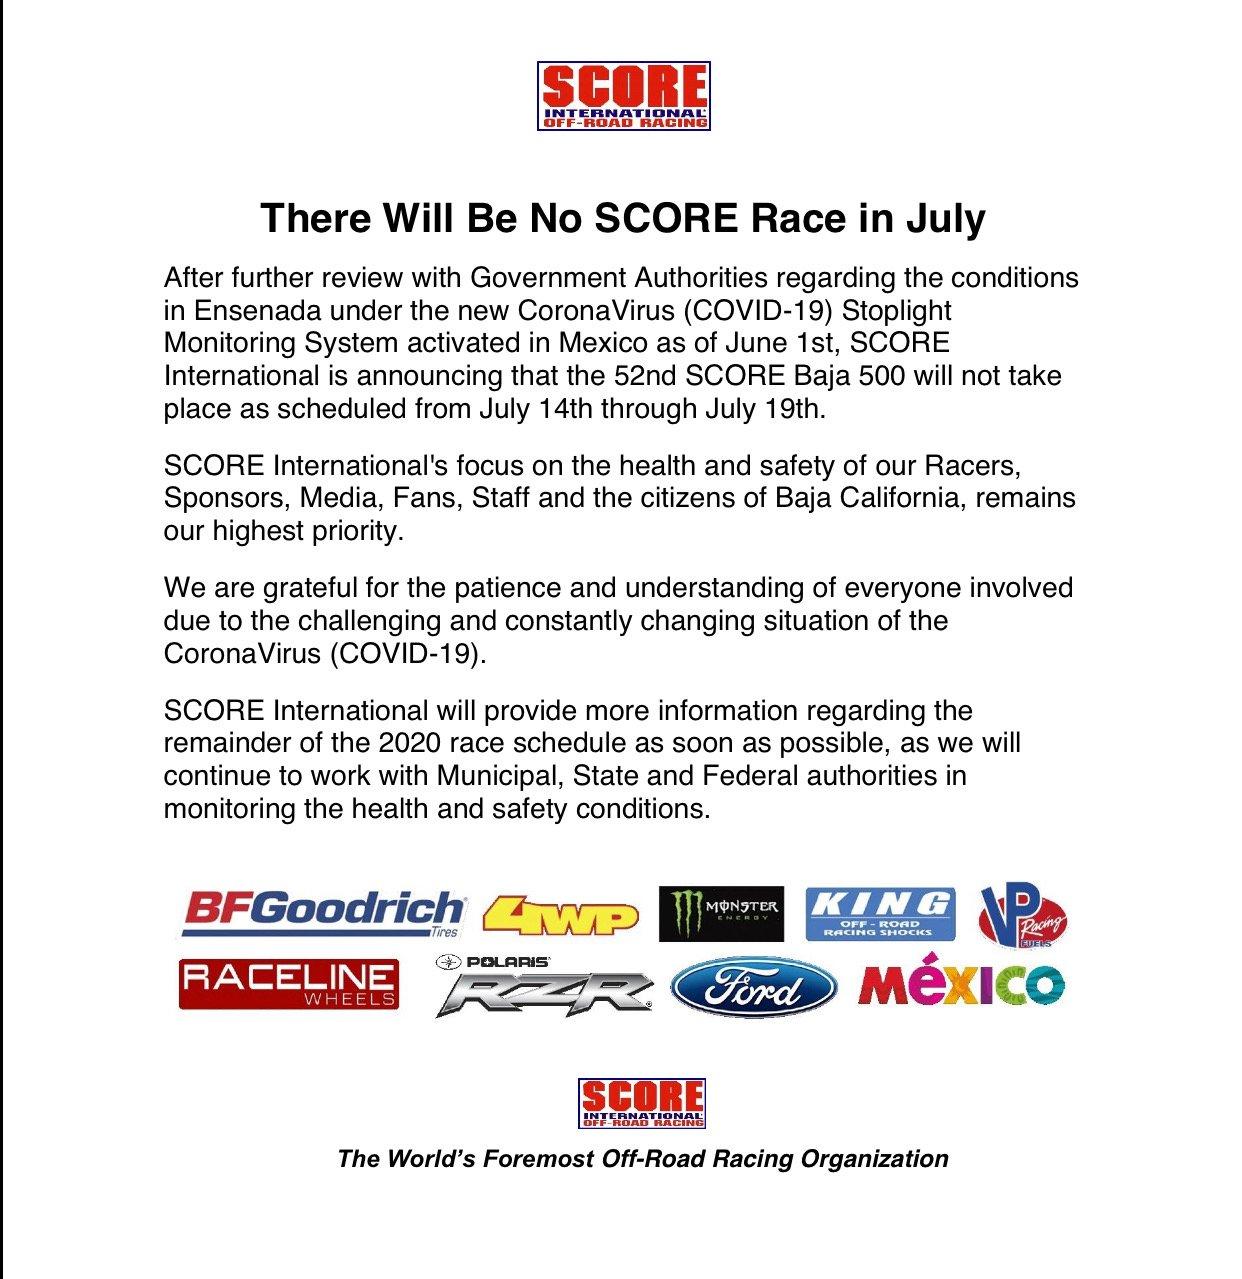 2020 score baja 500 announcement.jpg